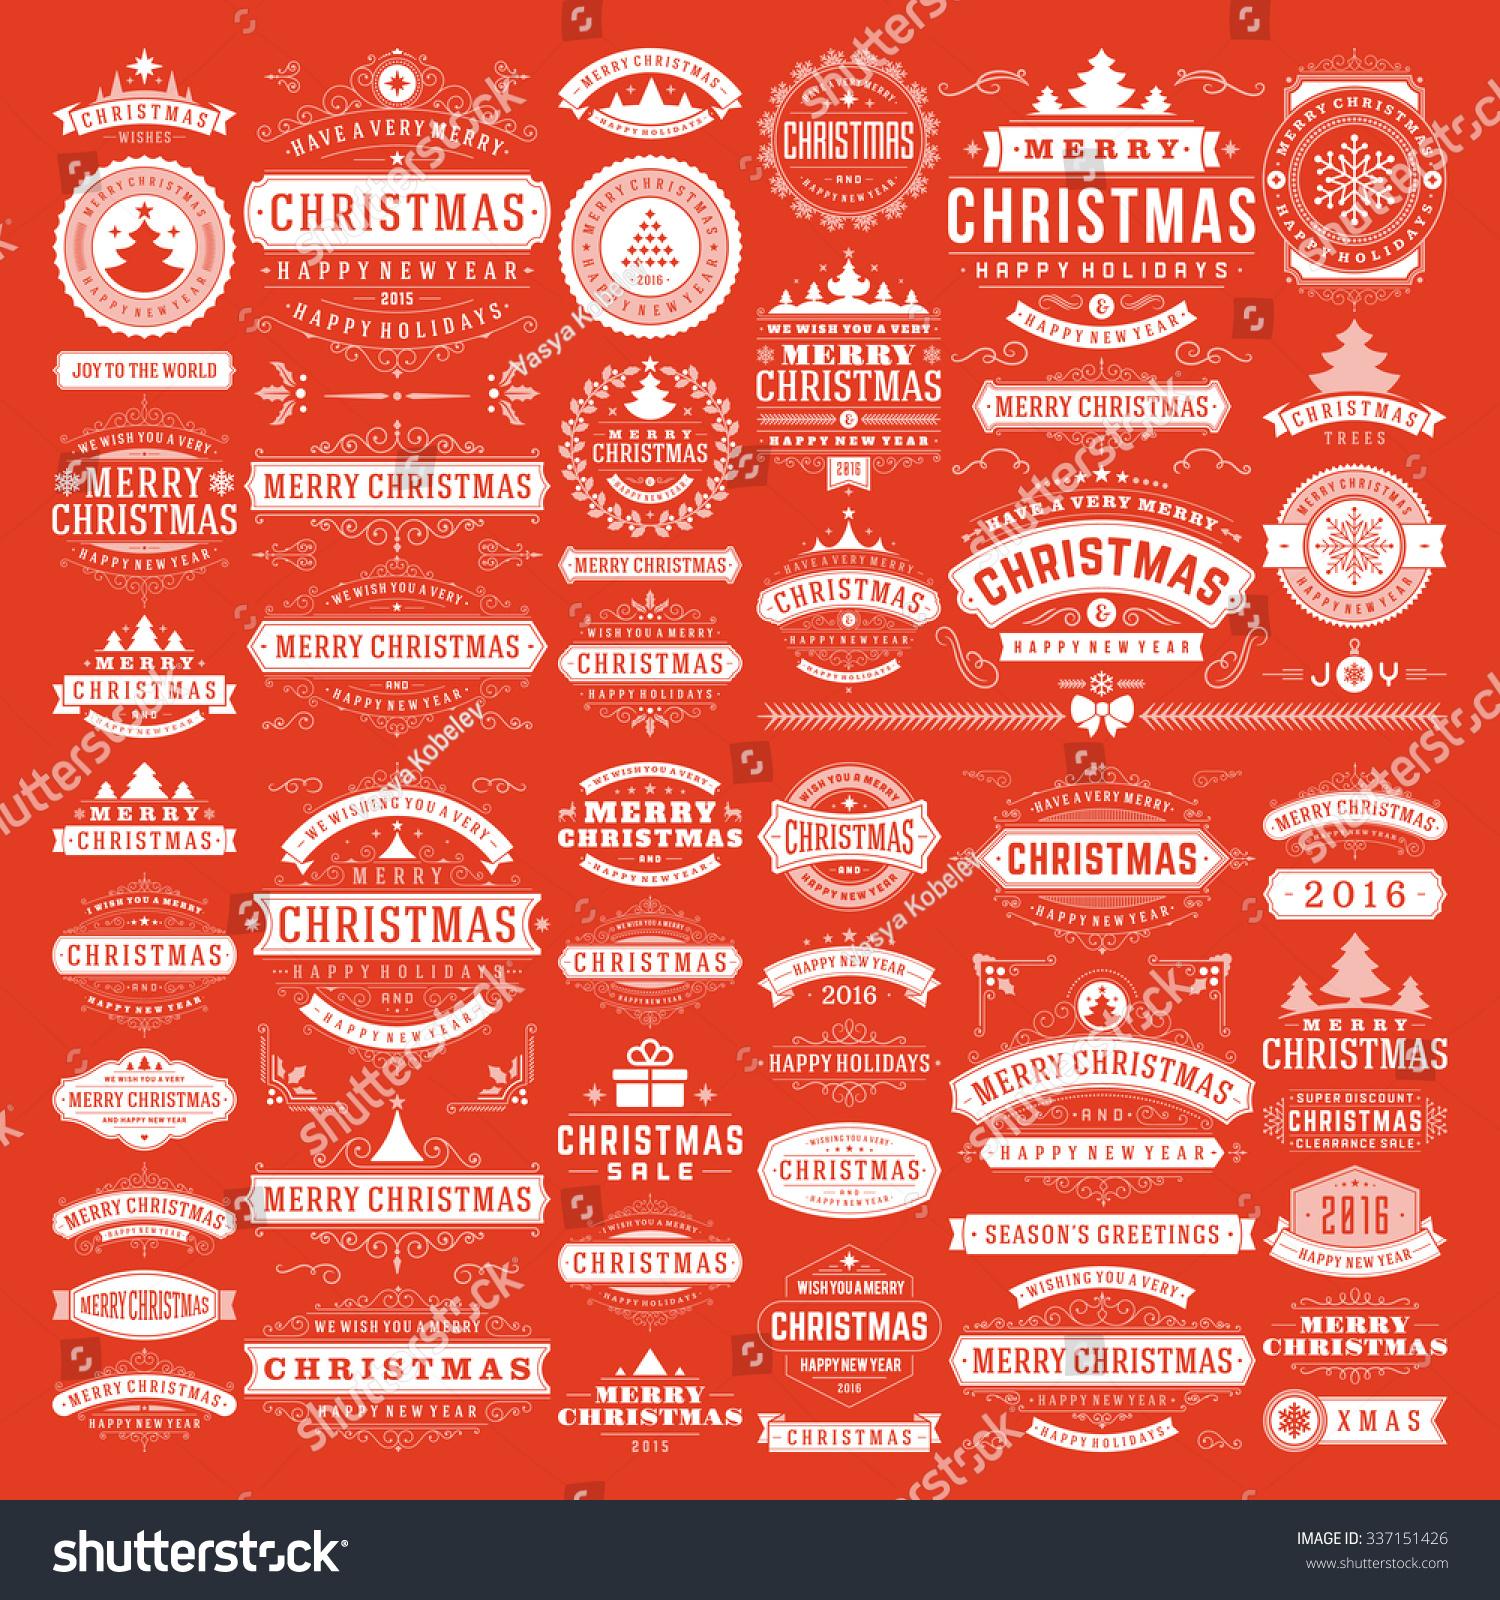 Christmas Decorations Vector Design Elements Typographic